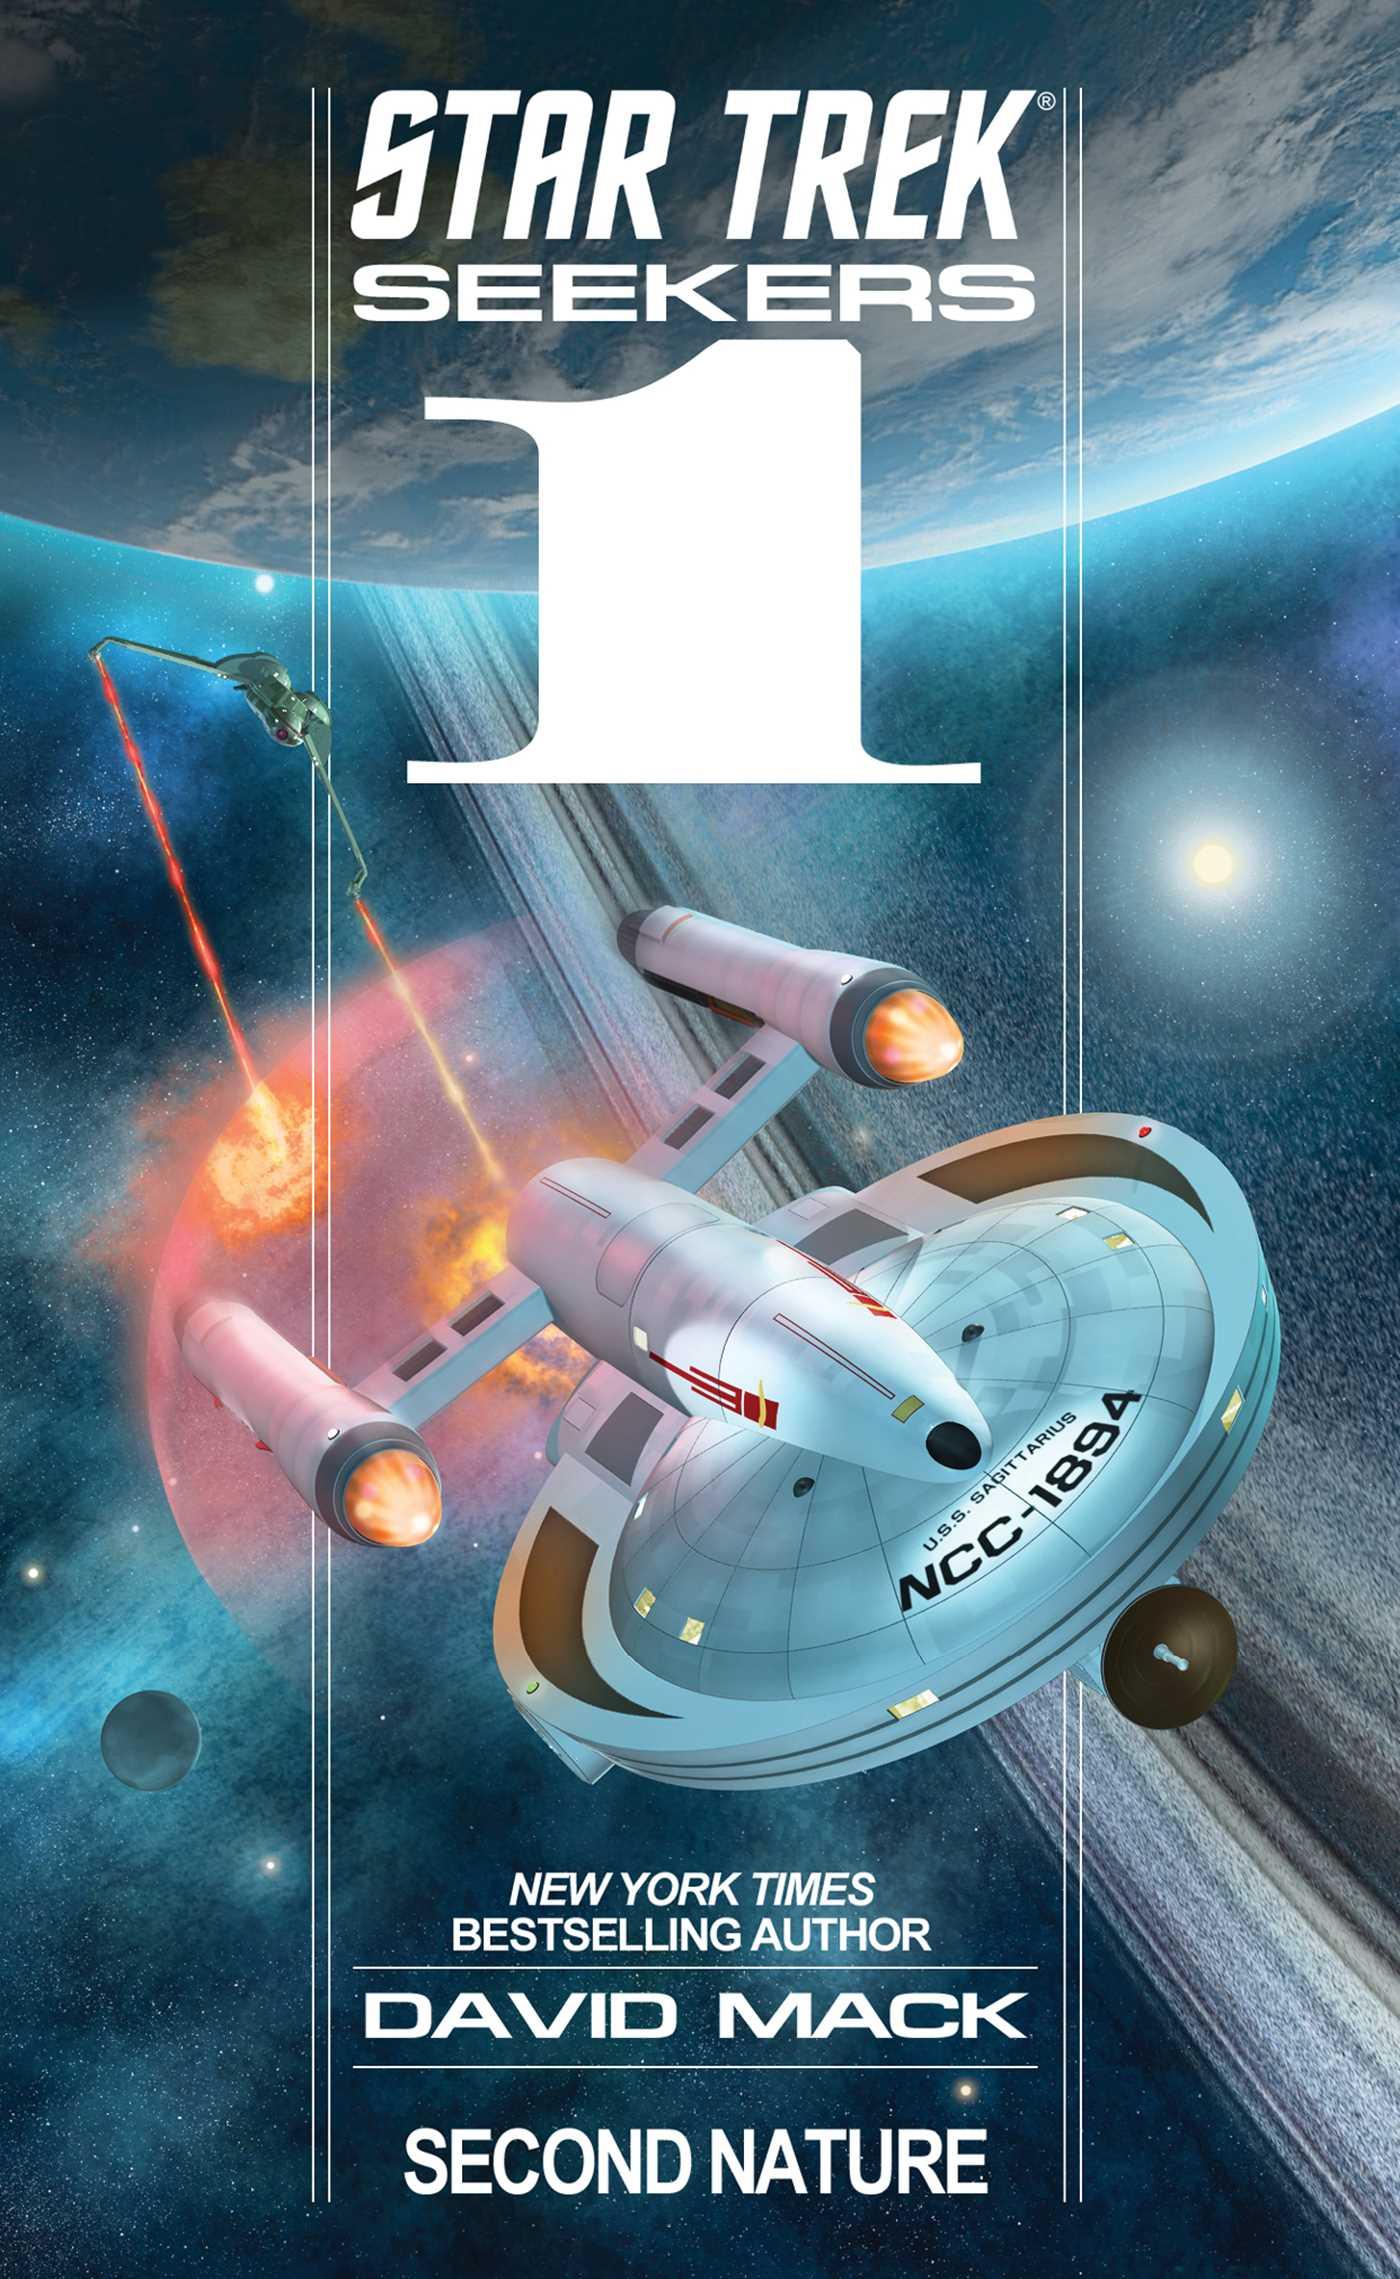 Star trek seekers second nature 9781476753126 hr